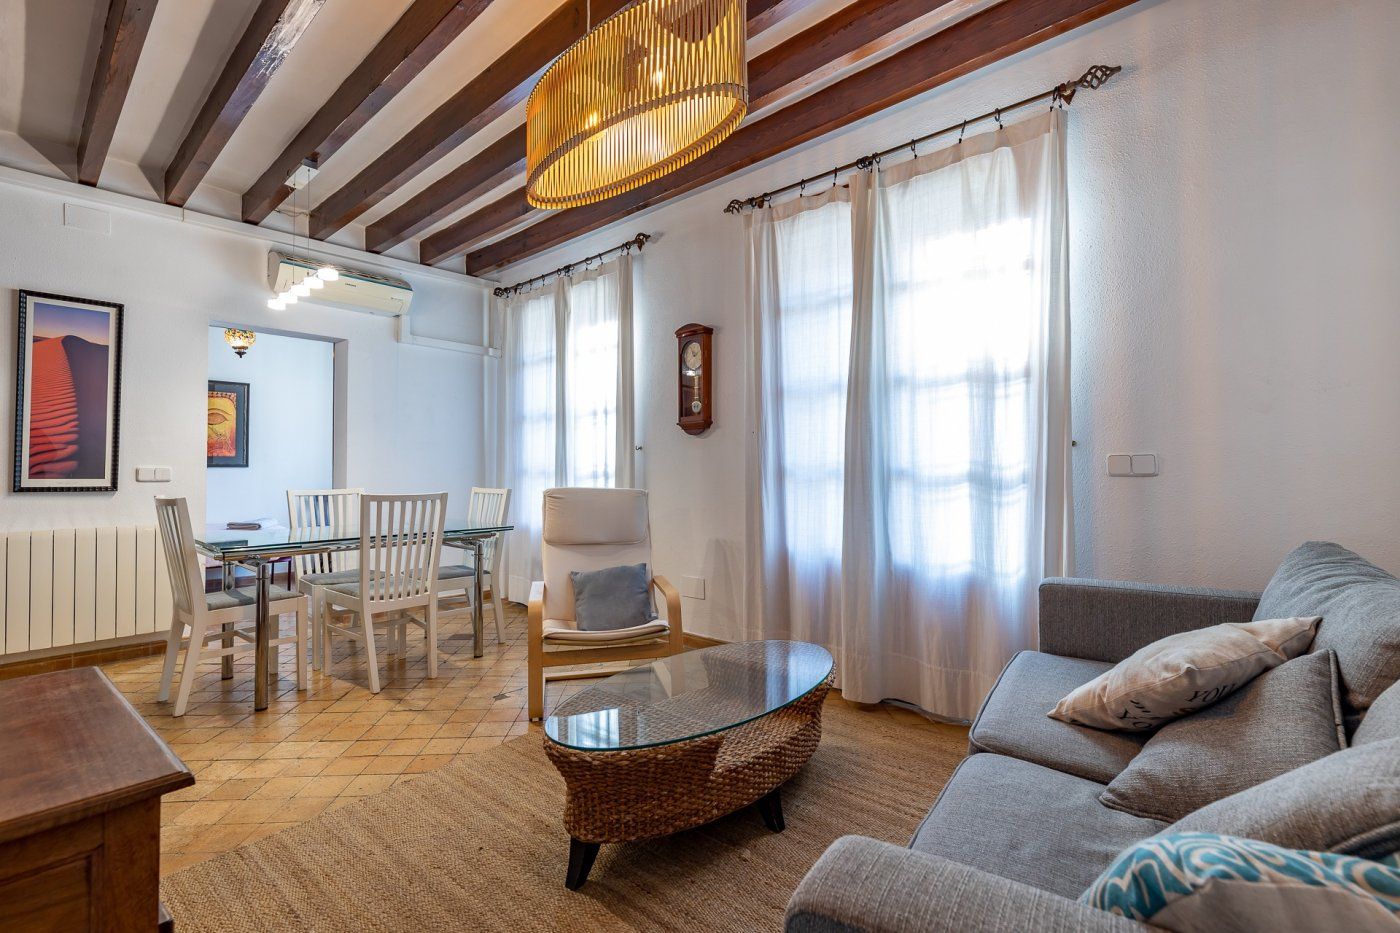 Espectacular apartamento en centro de palma - imagenInmueble5